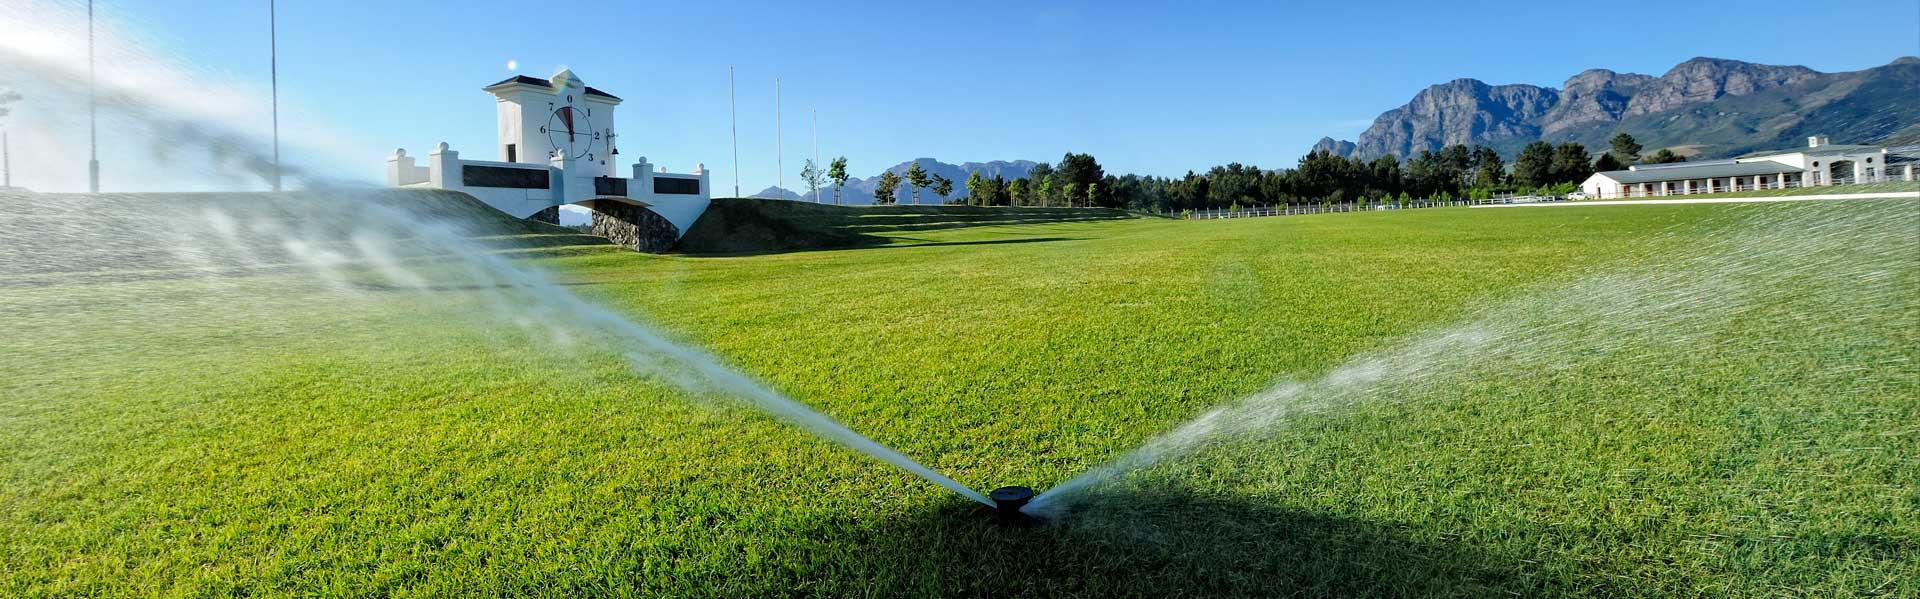 Irrigation Systems - Turfmanzi Irrigation